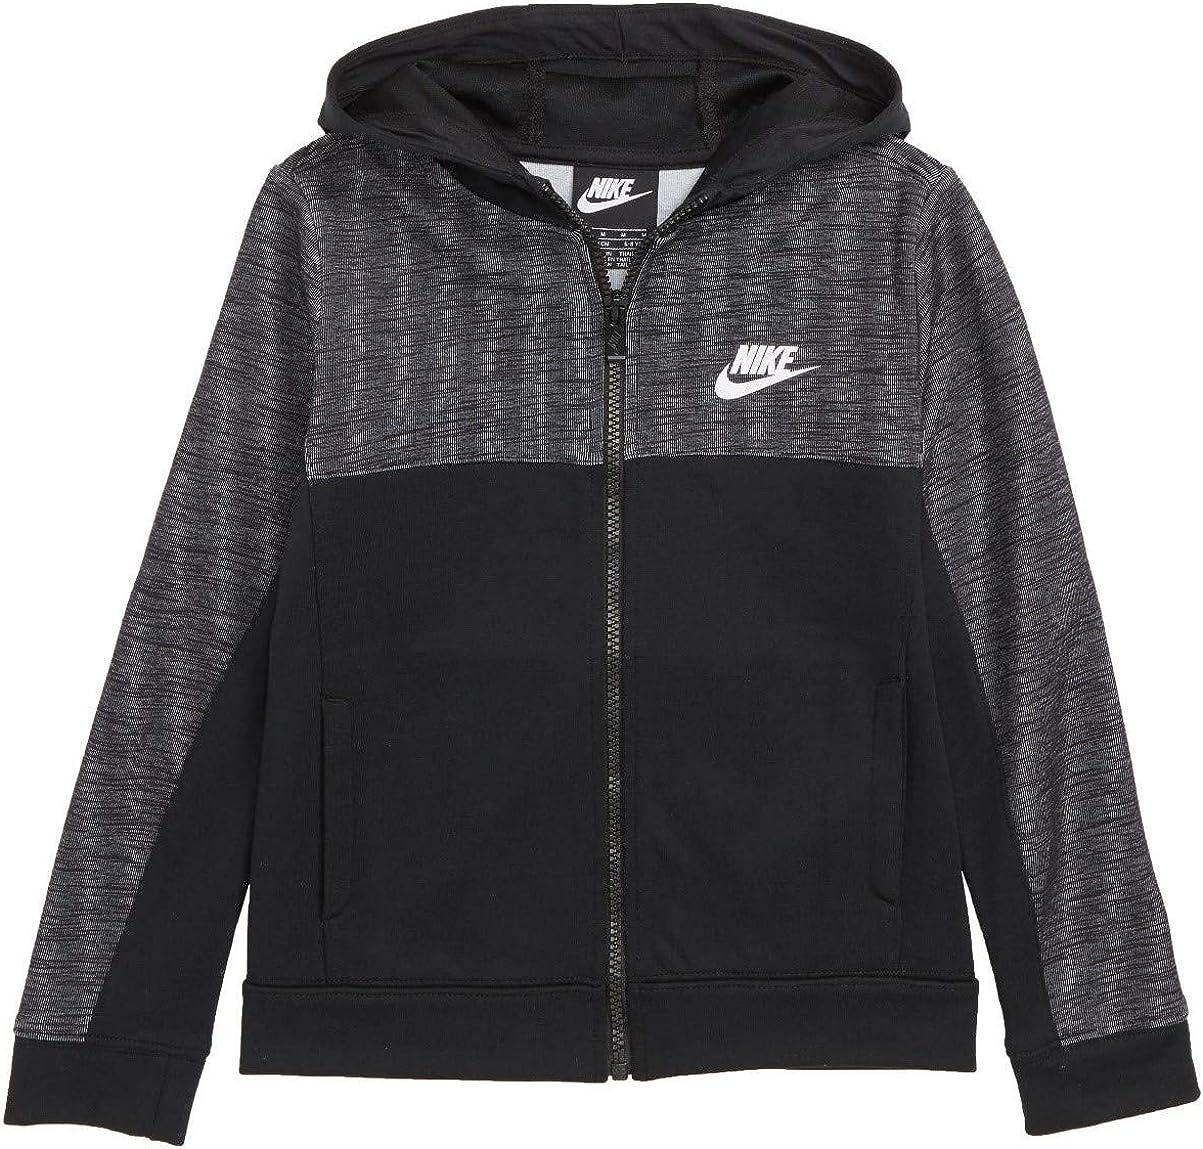 Nike Little Boys AV15 Zip Hoodie Black/Grey Size 6